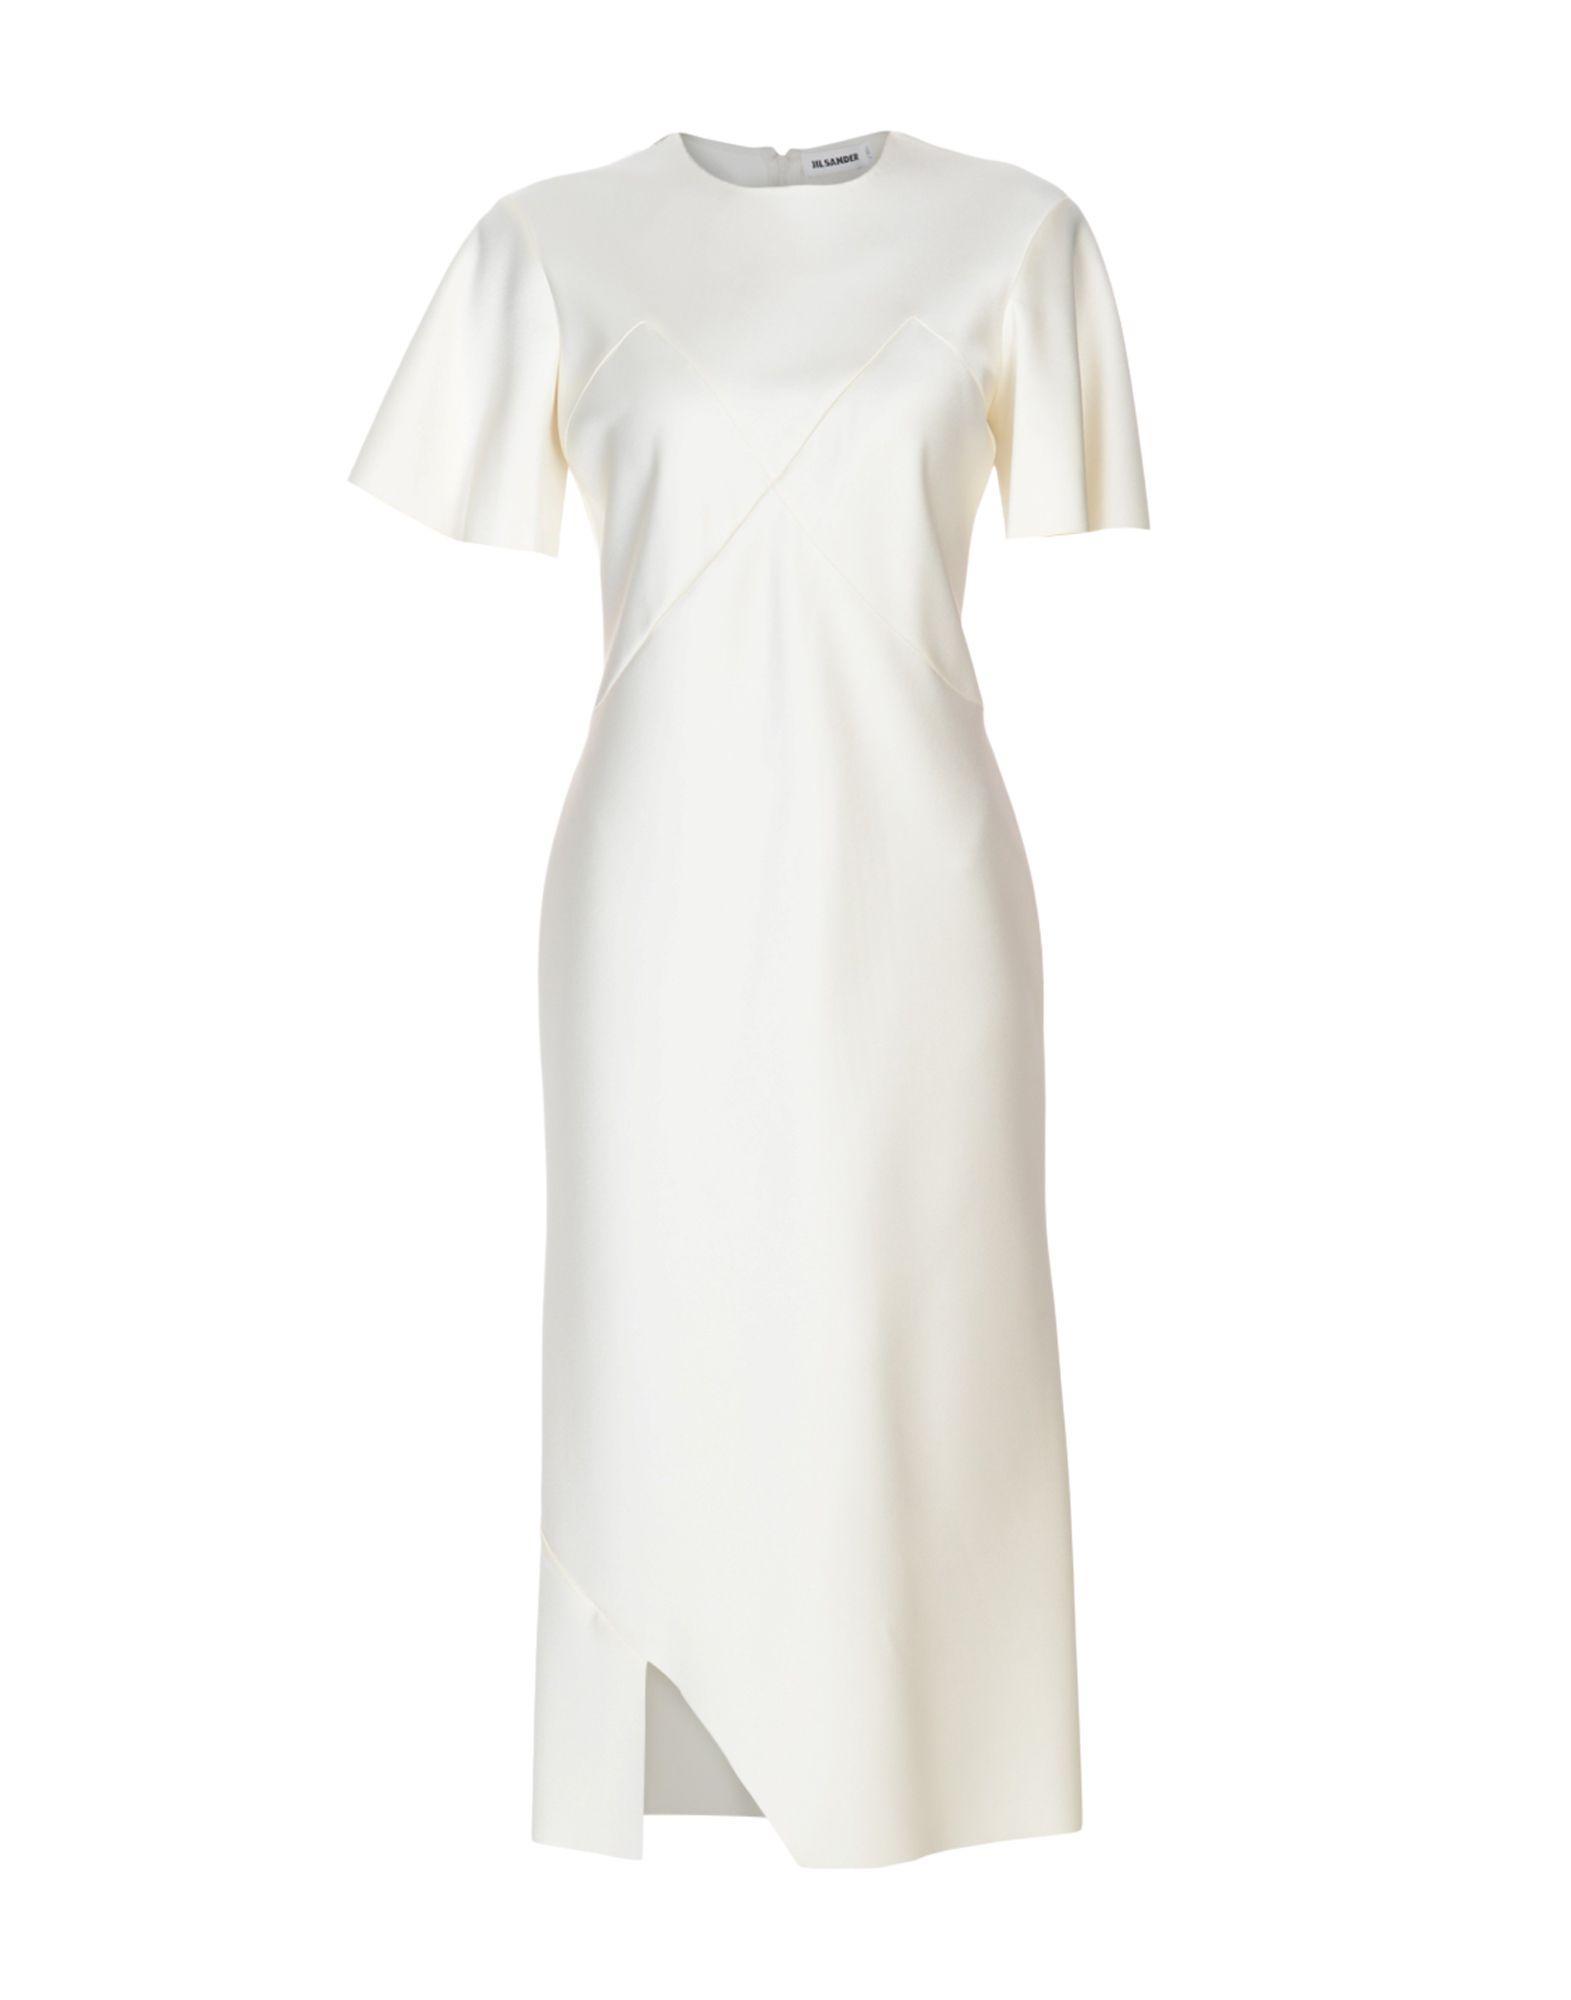 Jil Sander 3/4 Length Dresses In Ivory